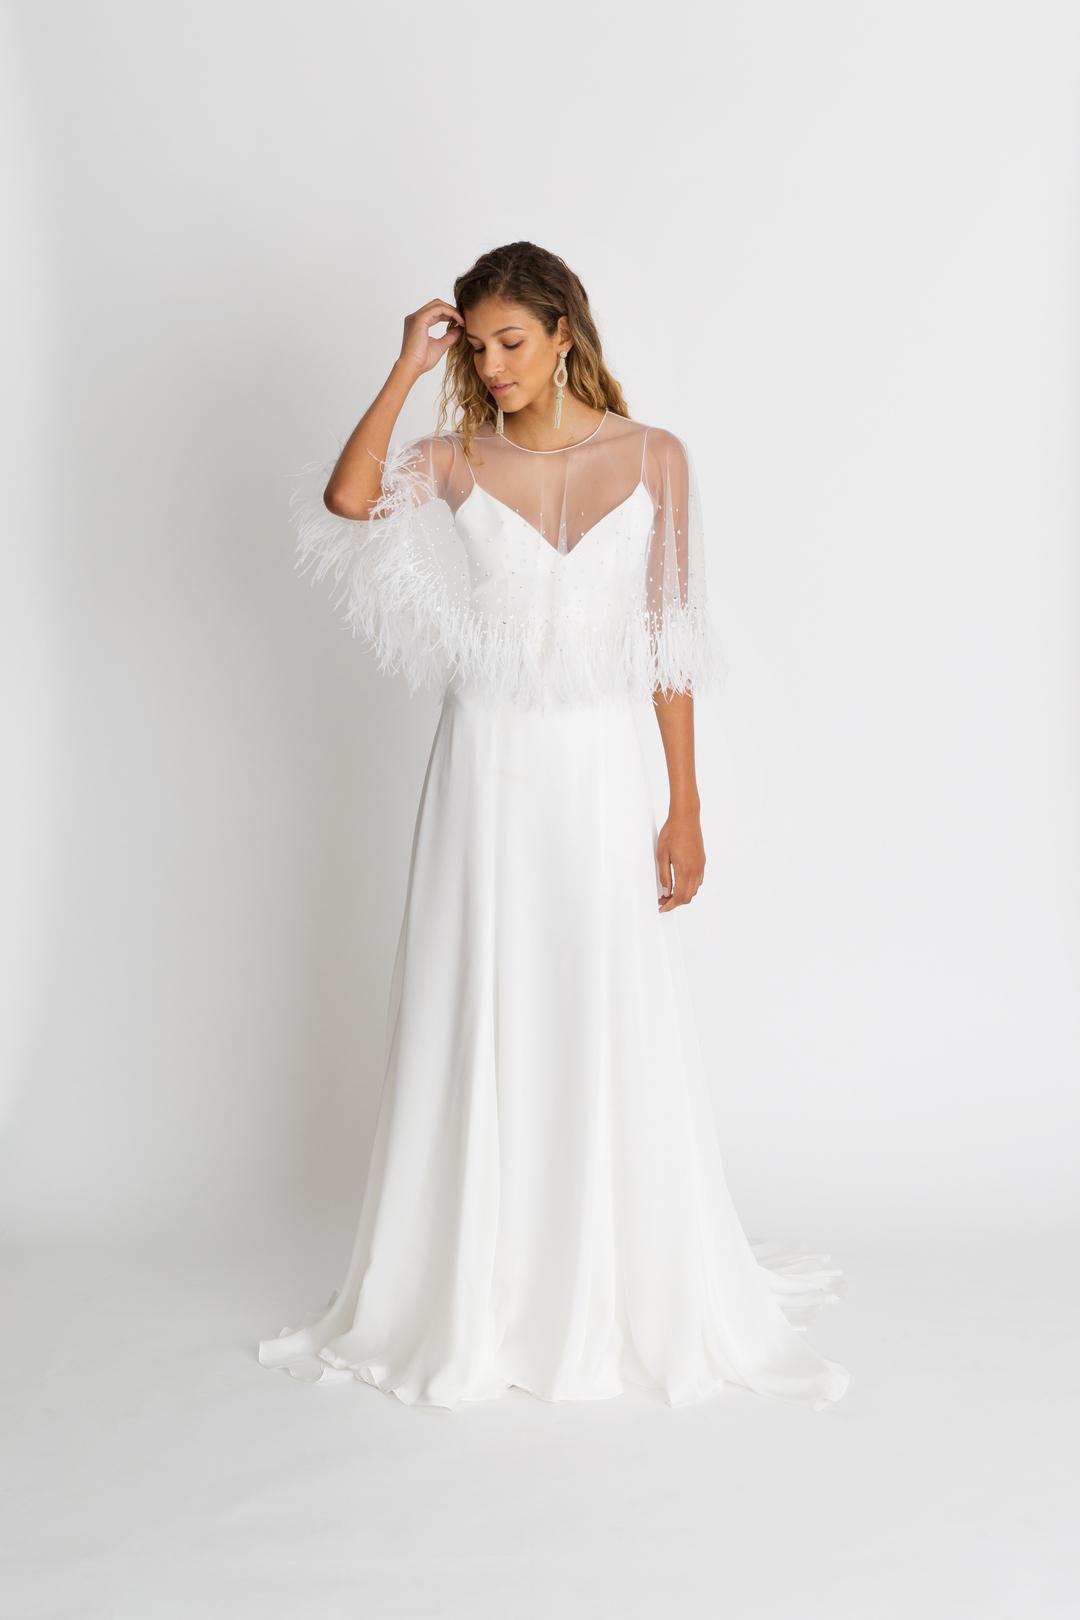 Dress main 2x 1543693215